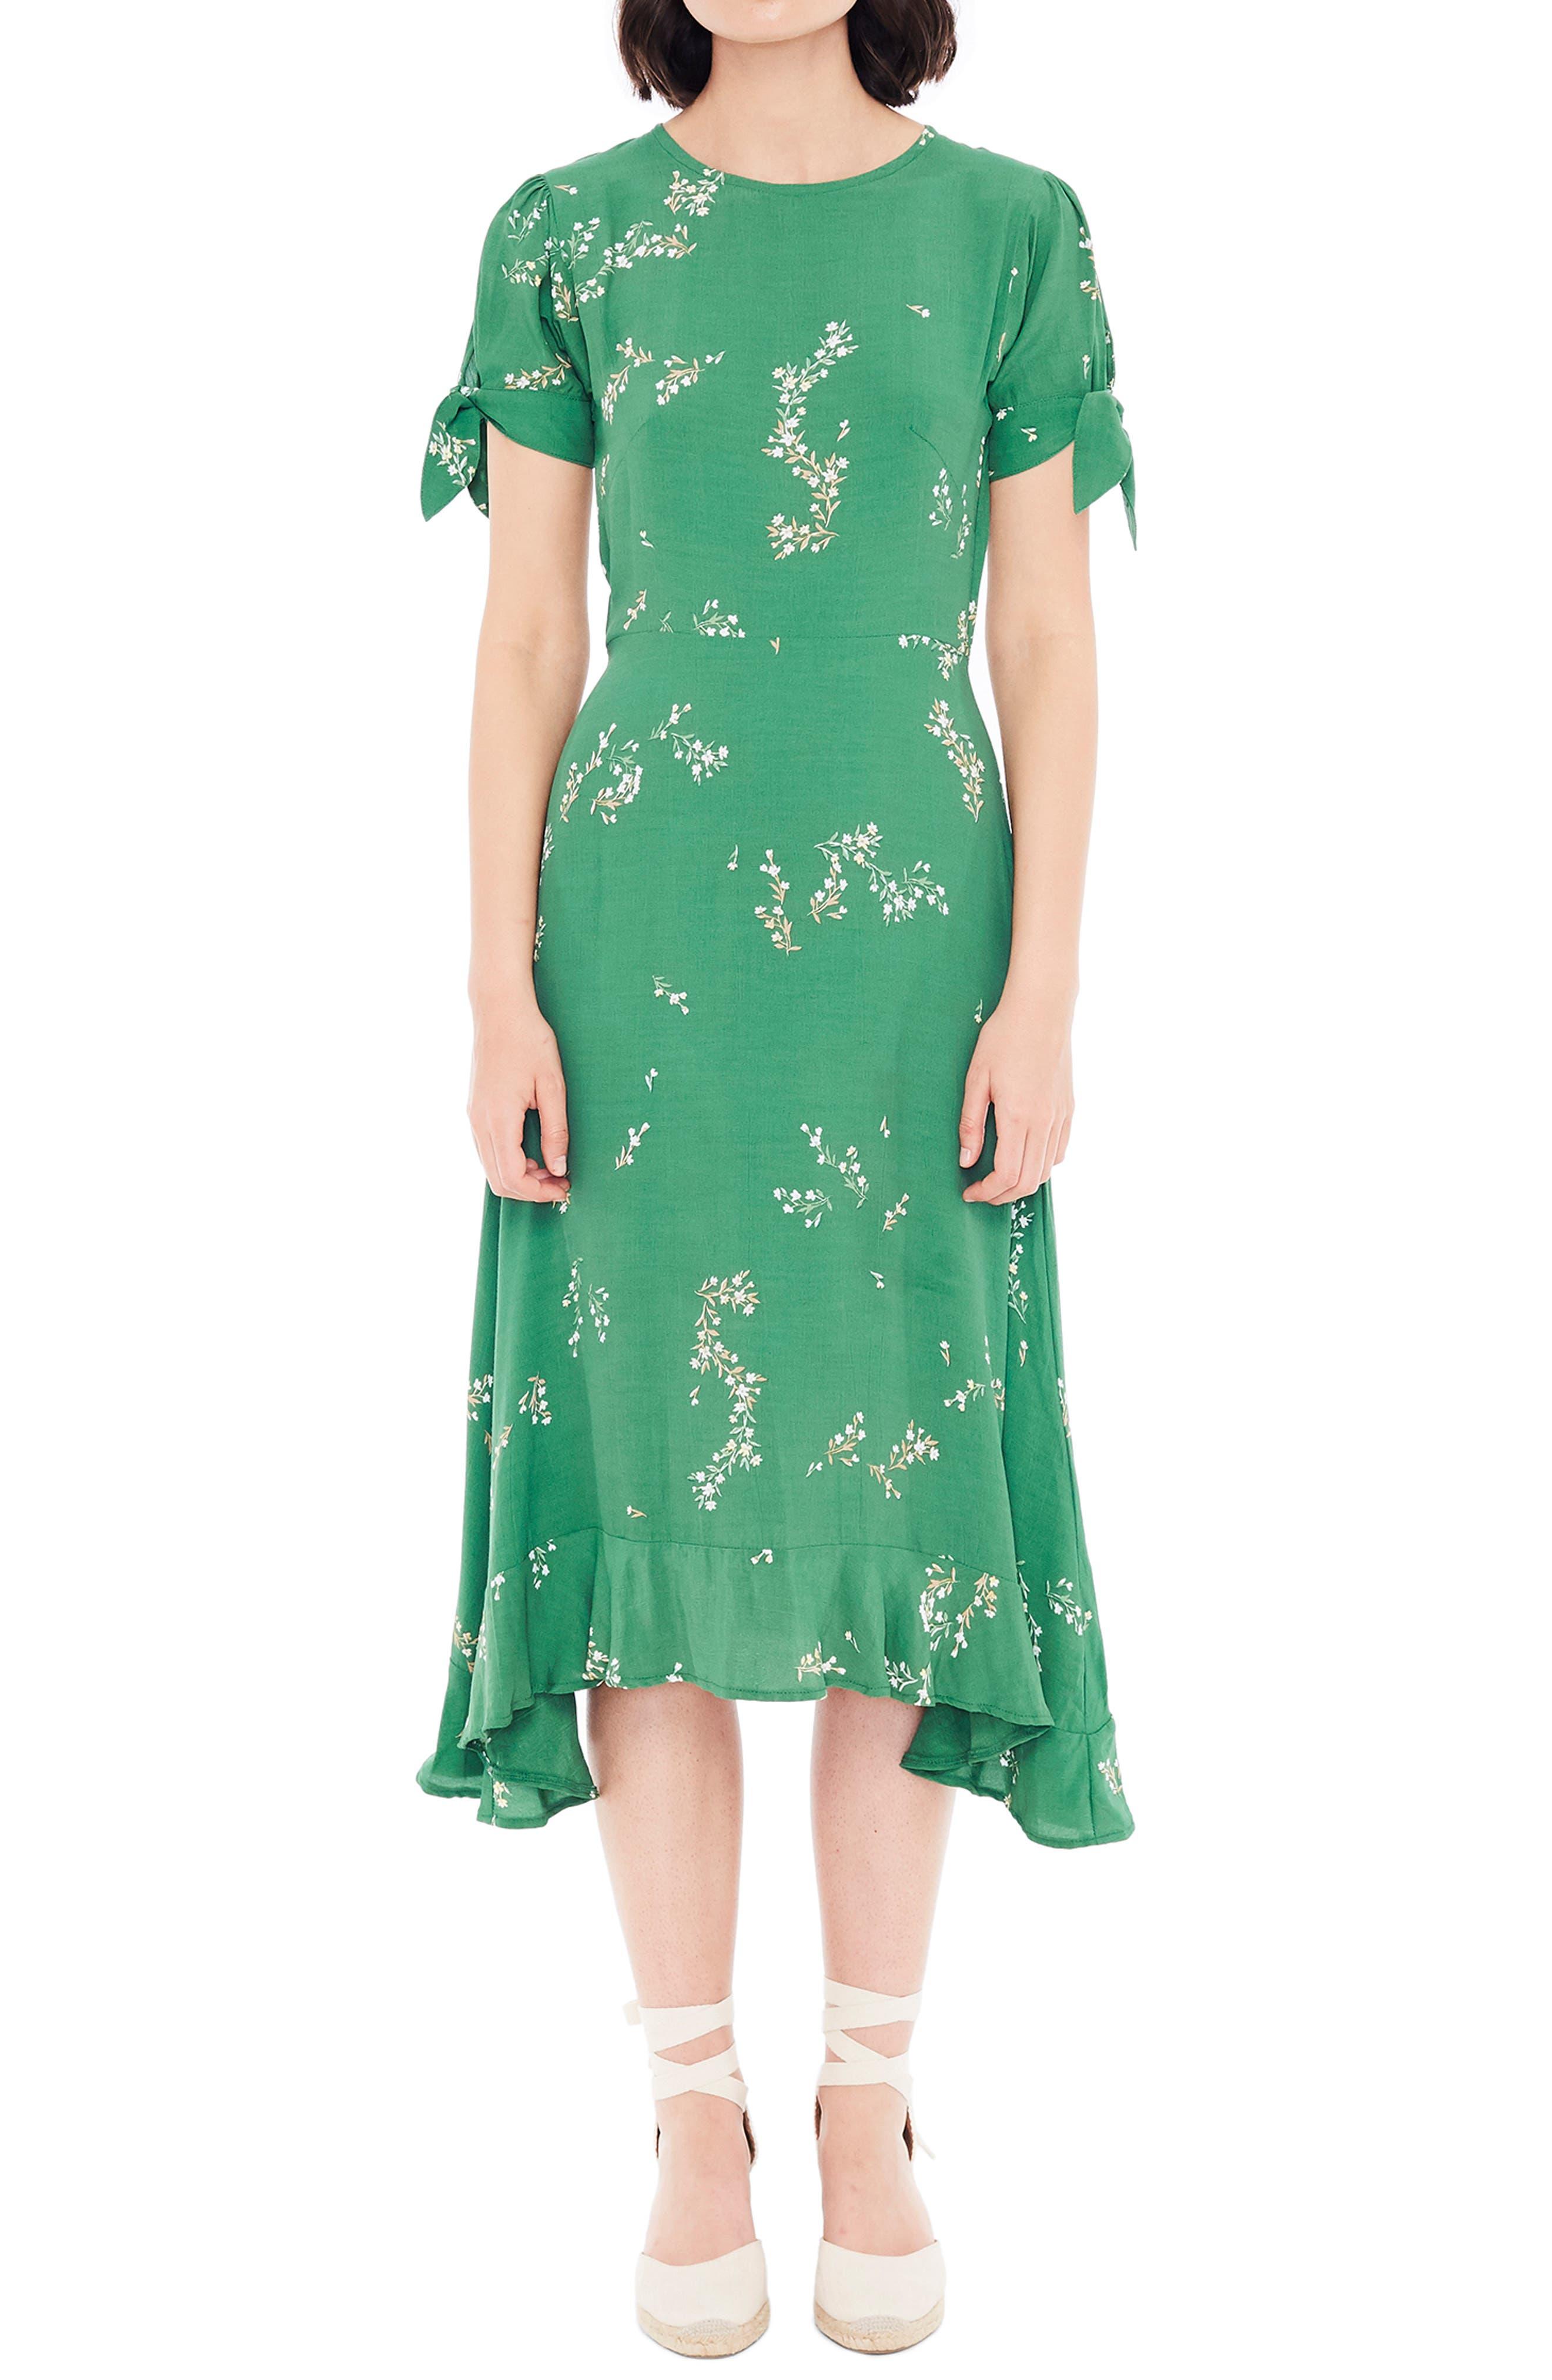 FAITHFULL THE BRAND, Emilia Floral Midi Dress, Alternate thumbnail 6, color, MYRTILLE FLORAL PRINT - GREEN